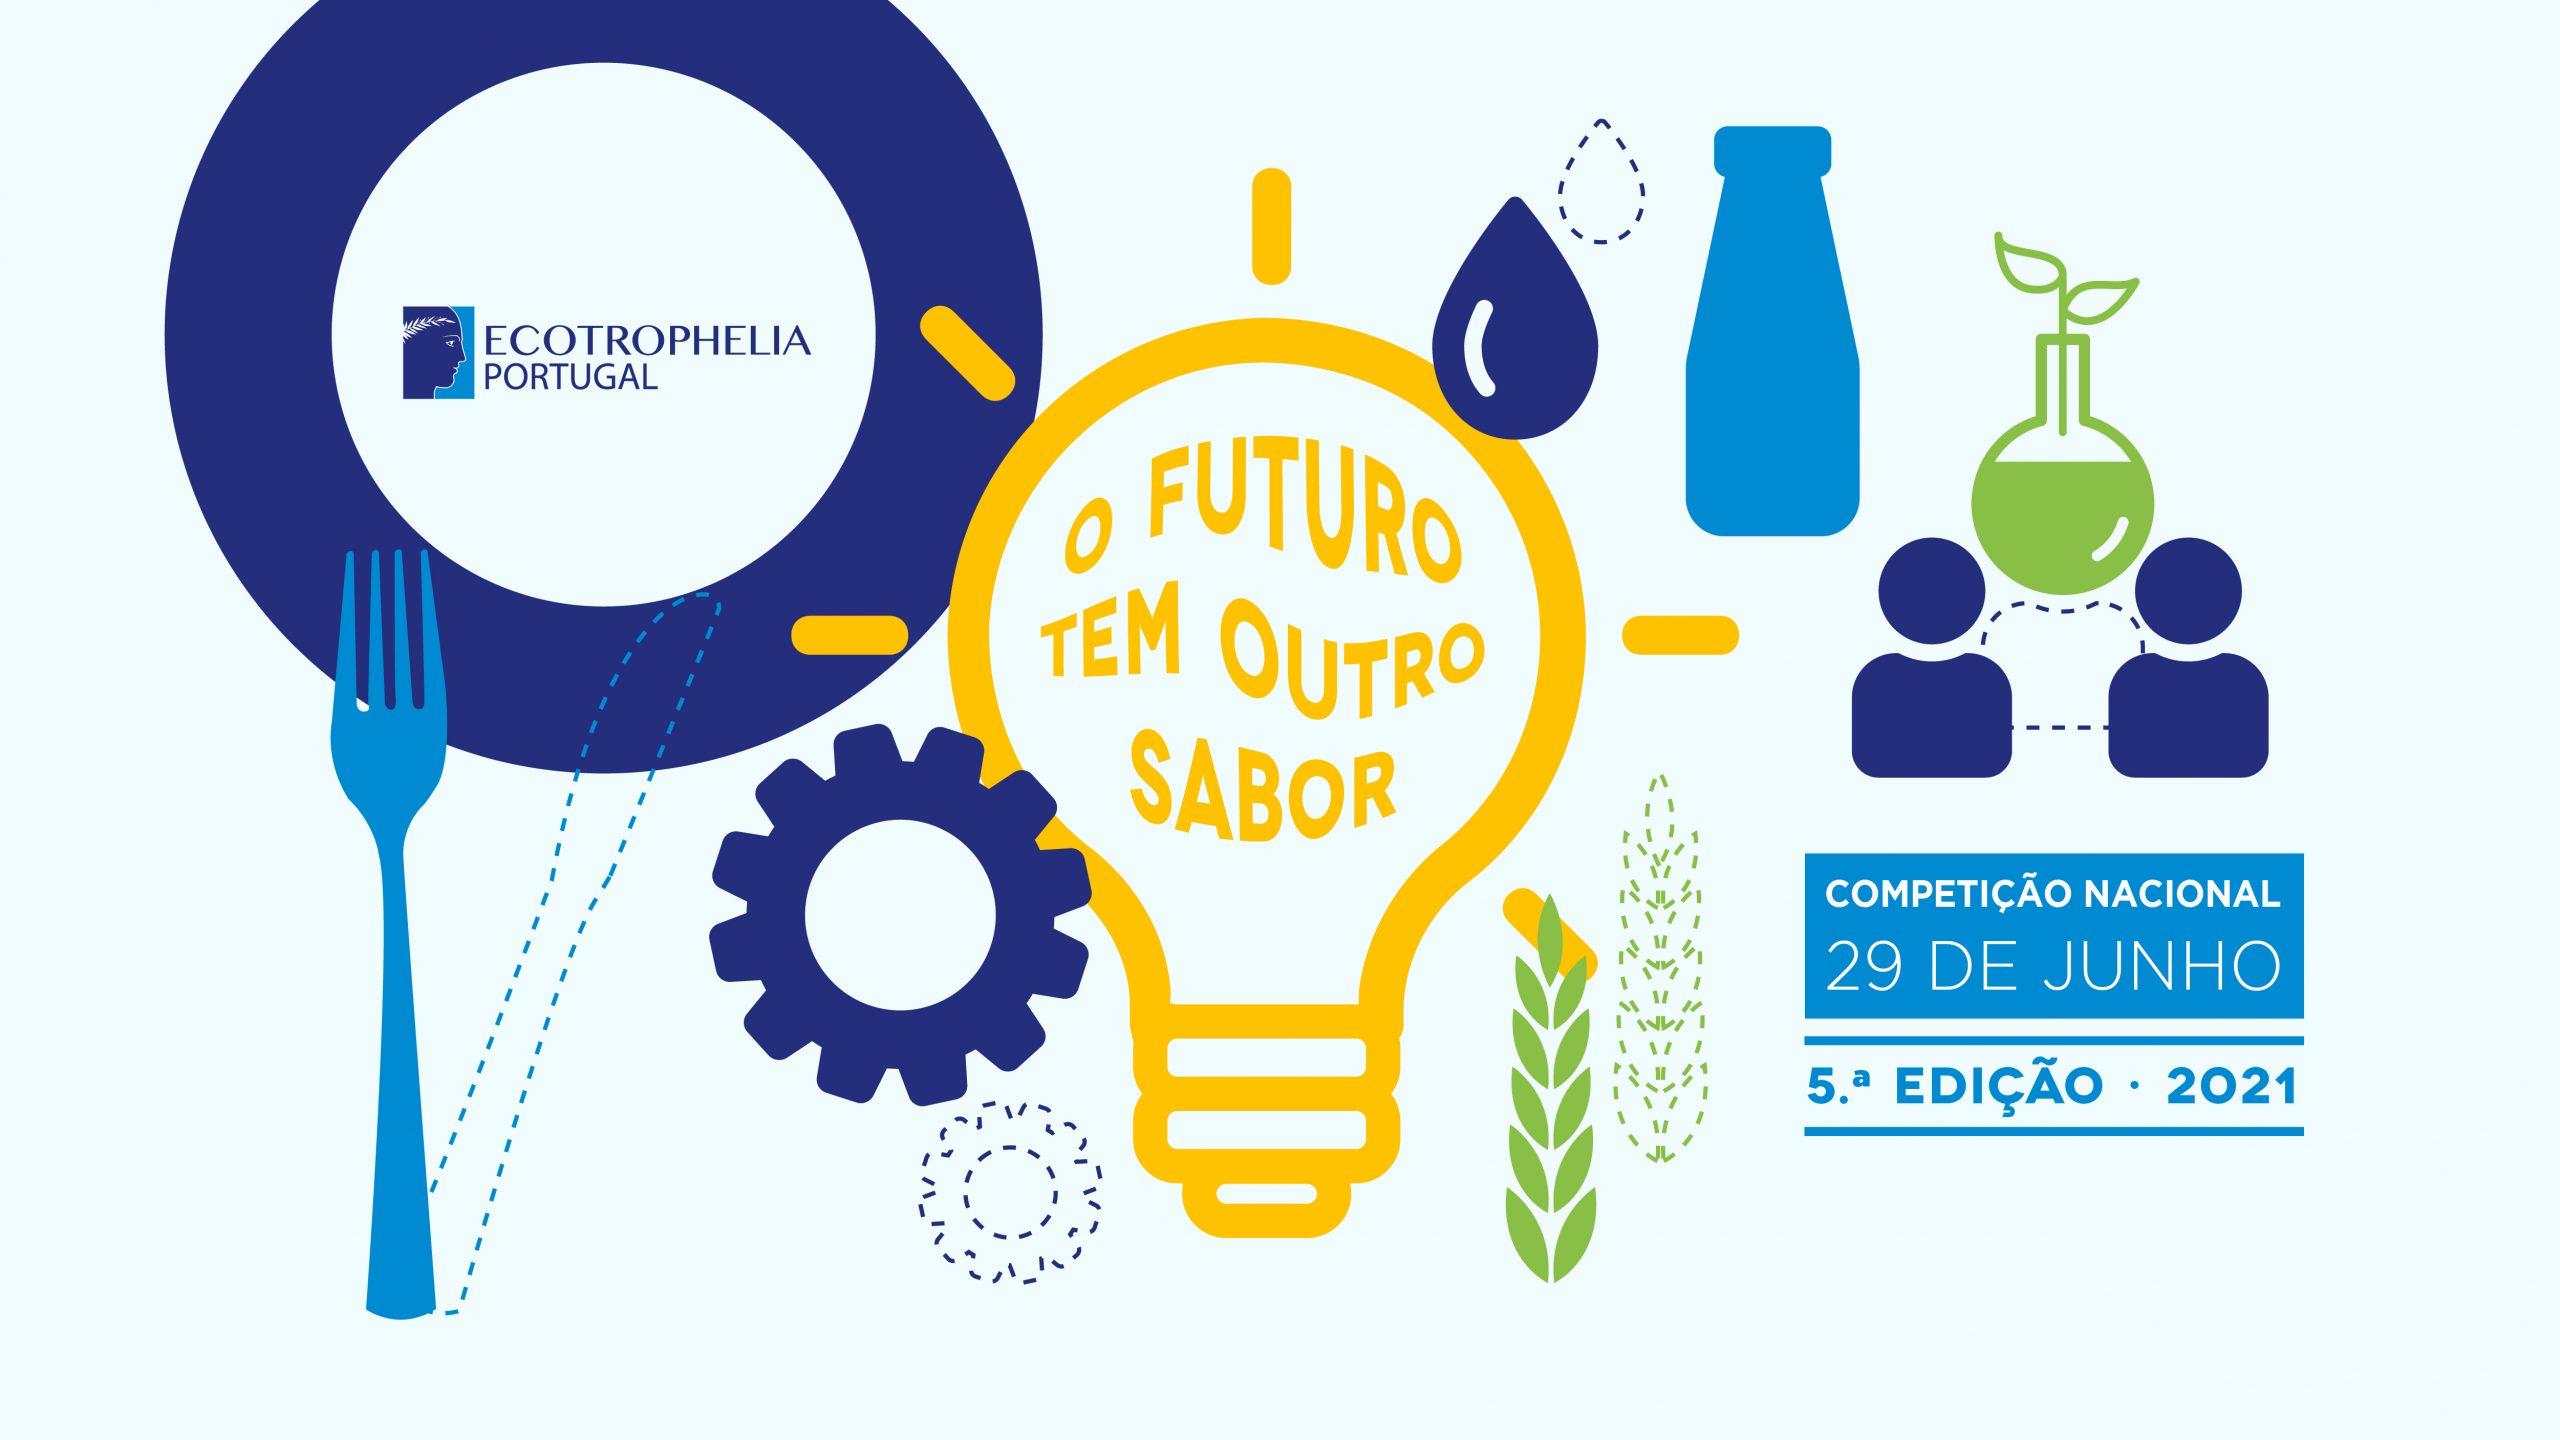 Ecotrophelia Portugal, Media, Press Release, Vencedores do Prémio ECOTROPHELIA Portugal 2021